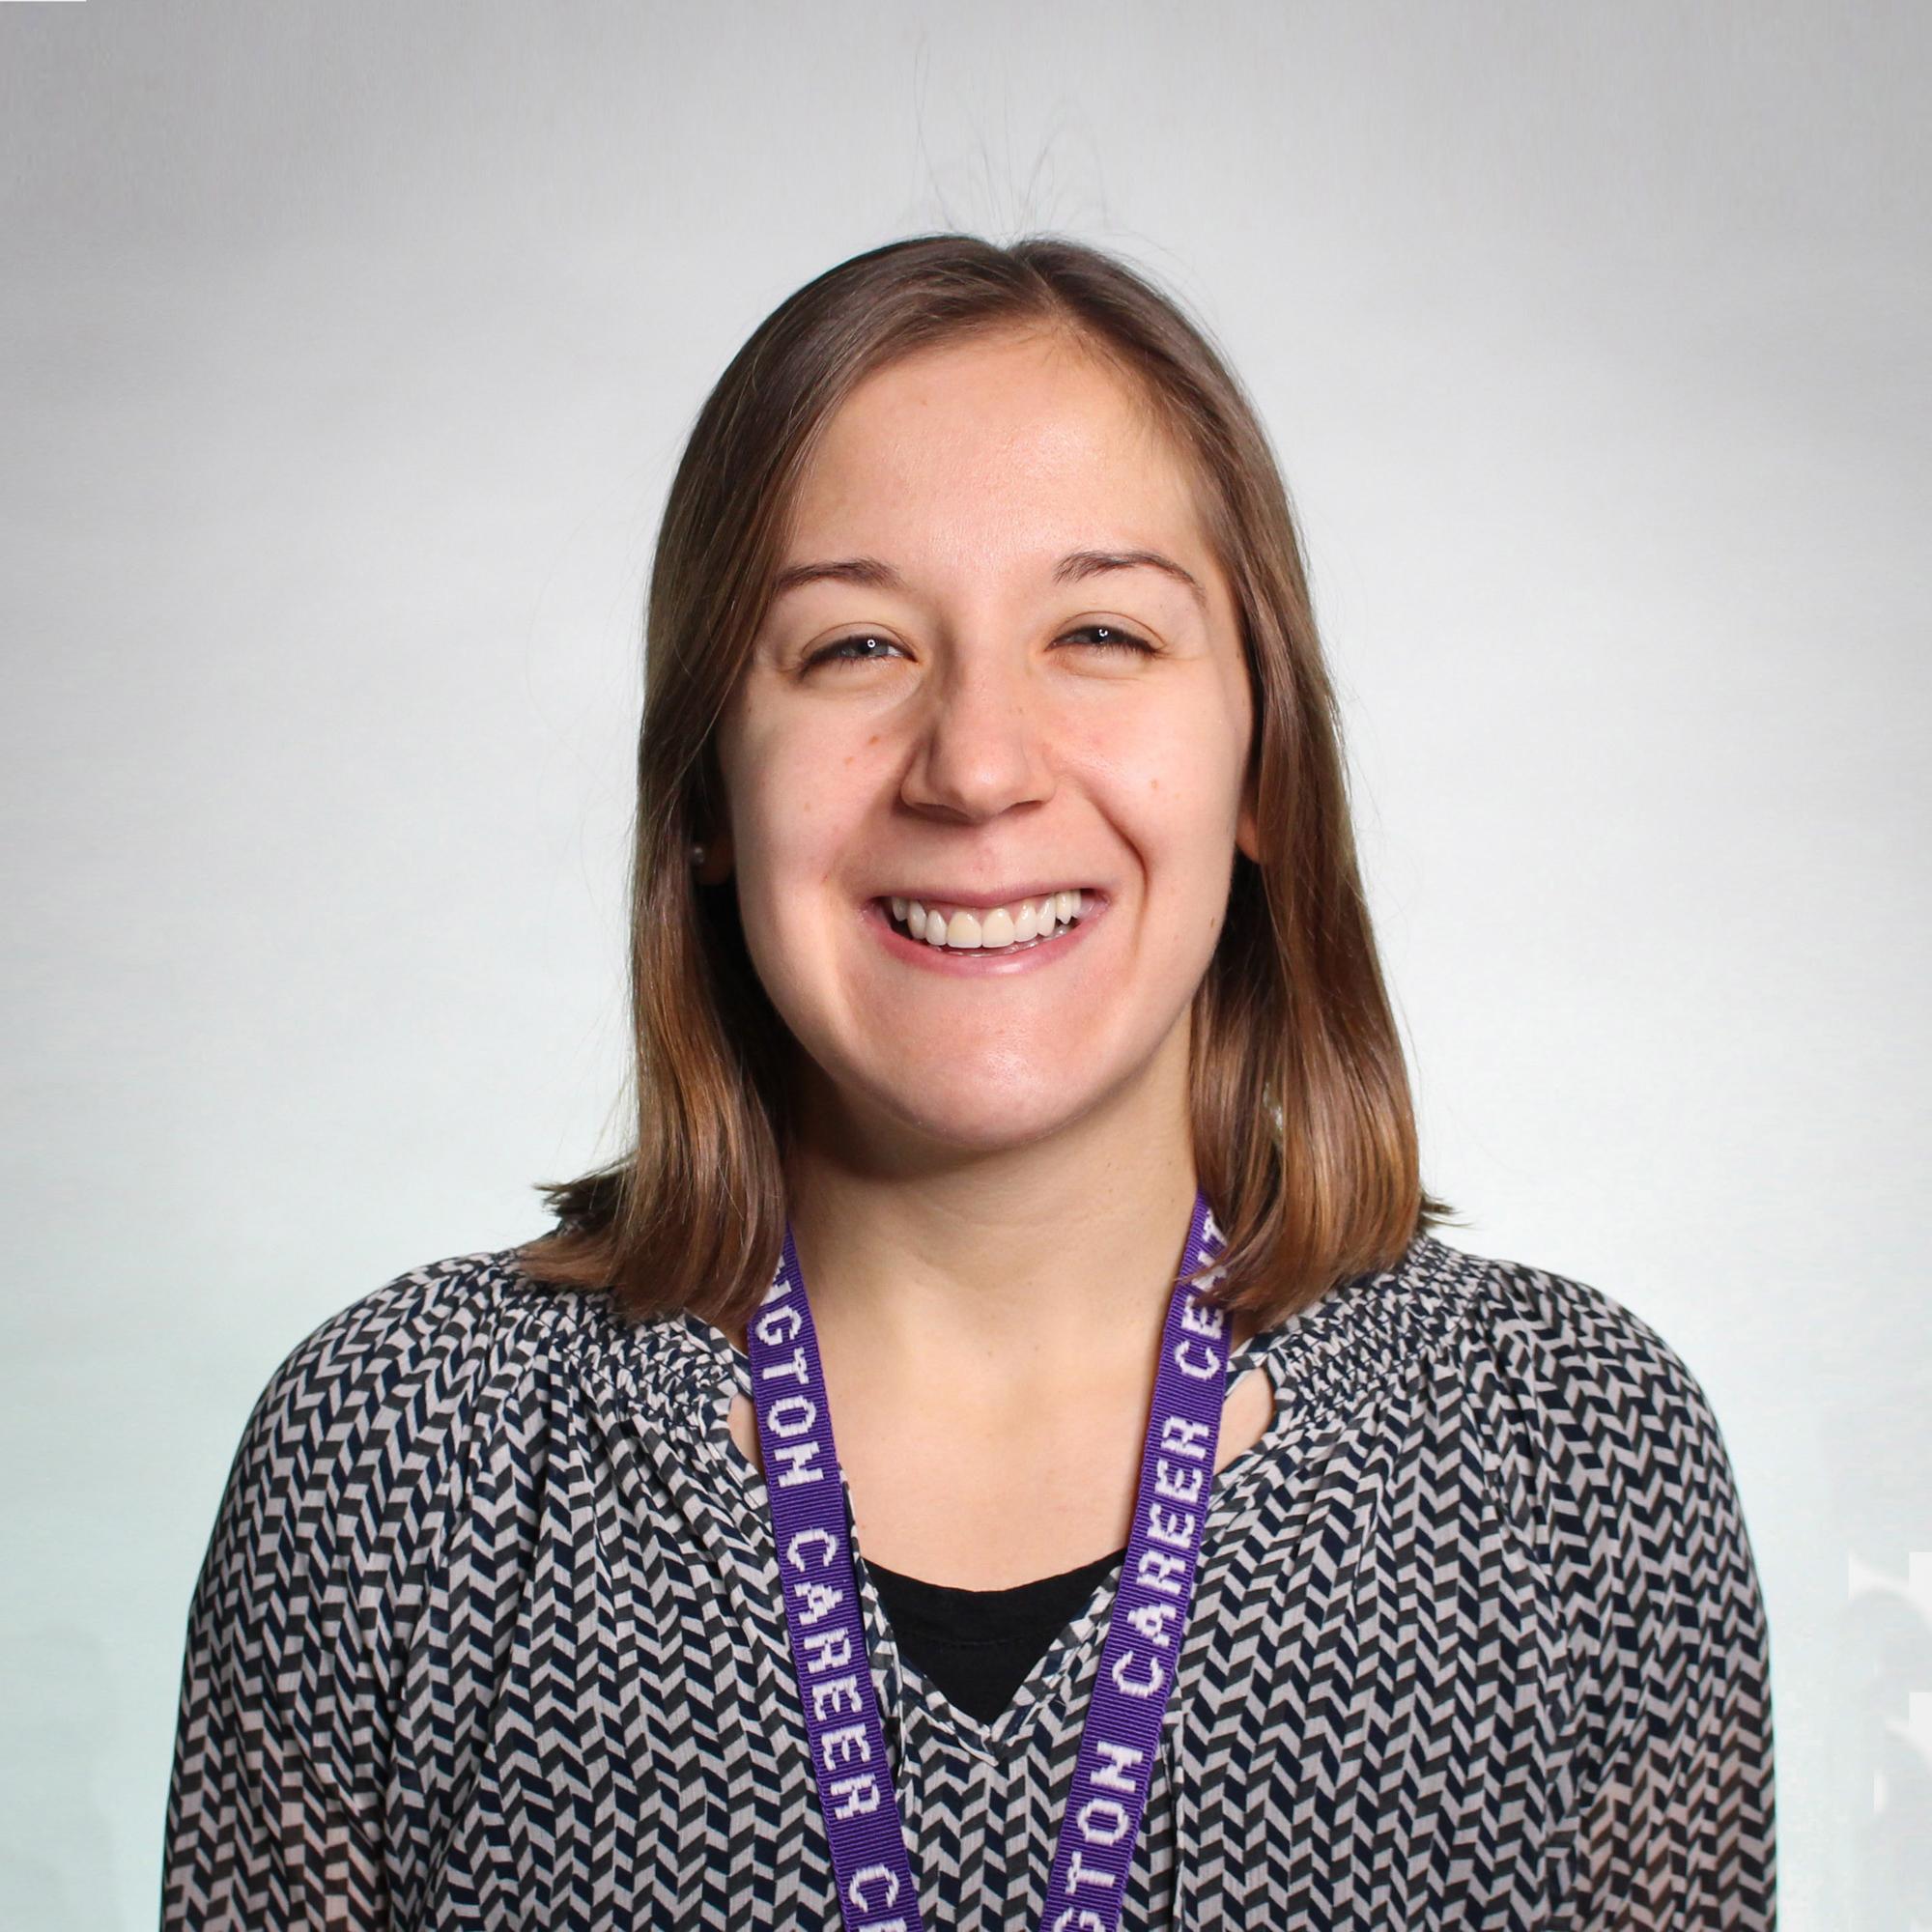 Ms. Christina Ascani